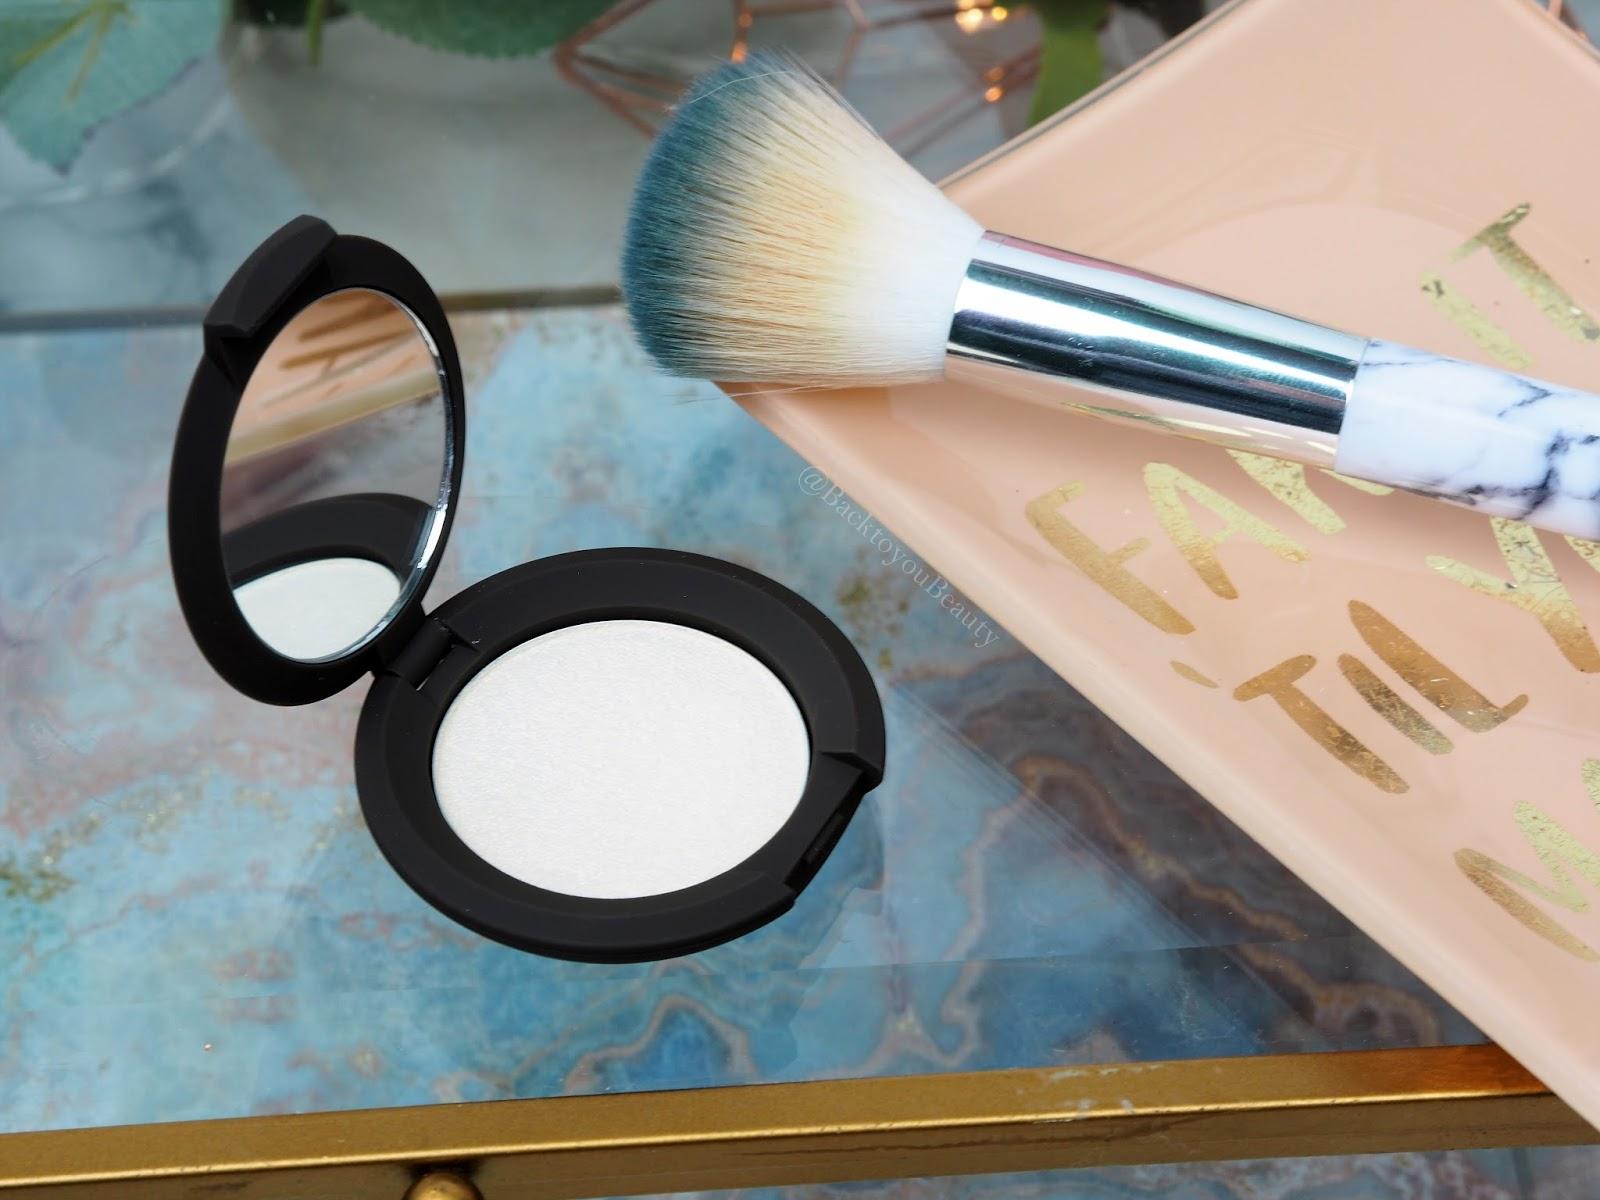 Becca Shimmering skin perfector in Vanilla Quartz